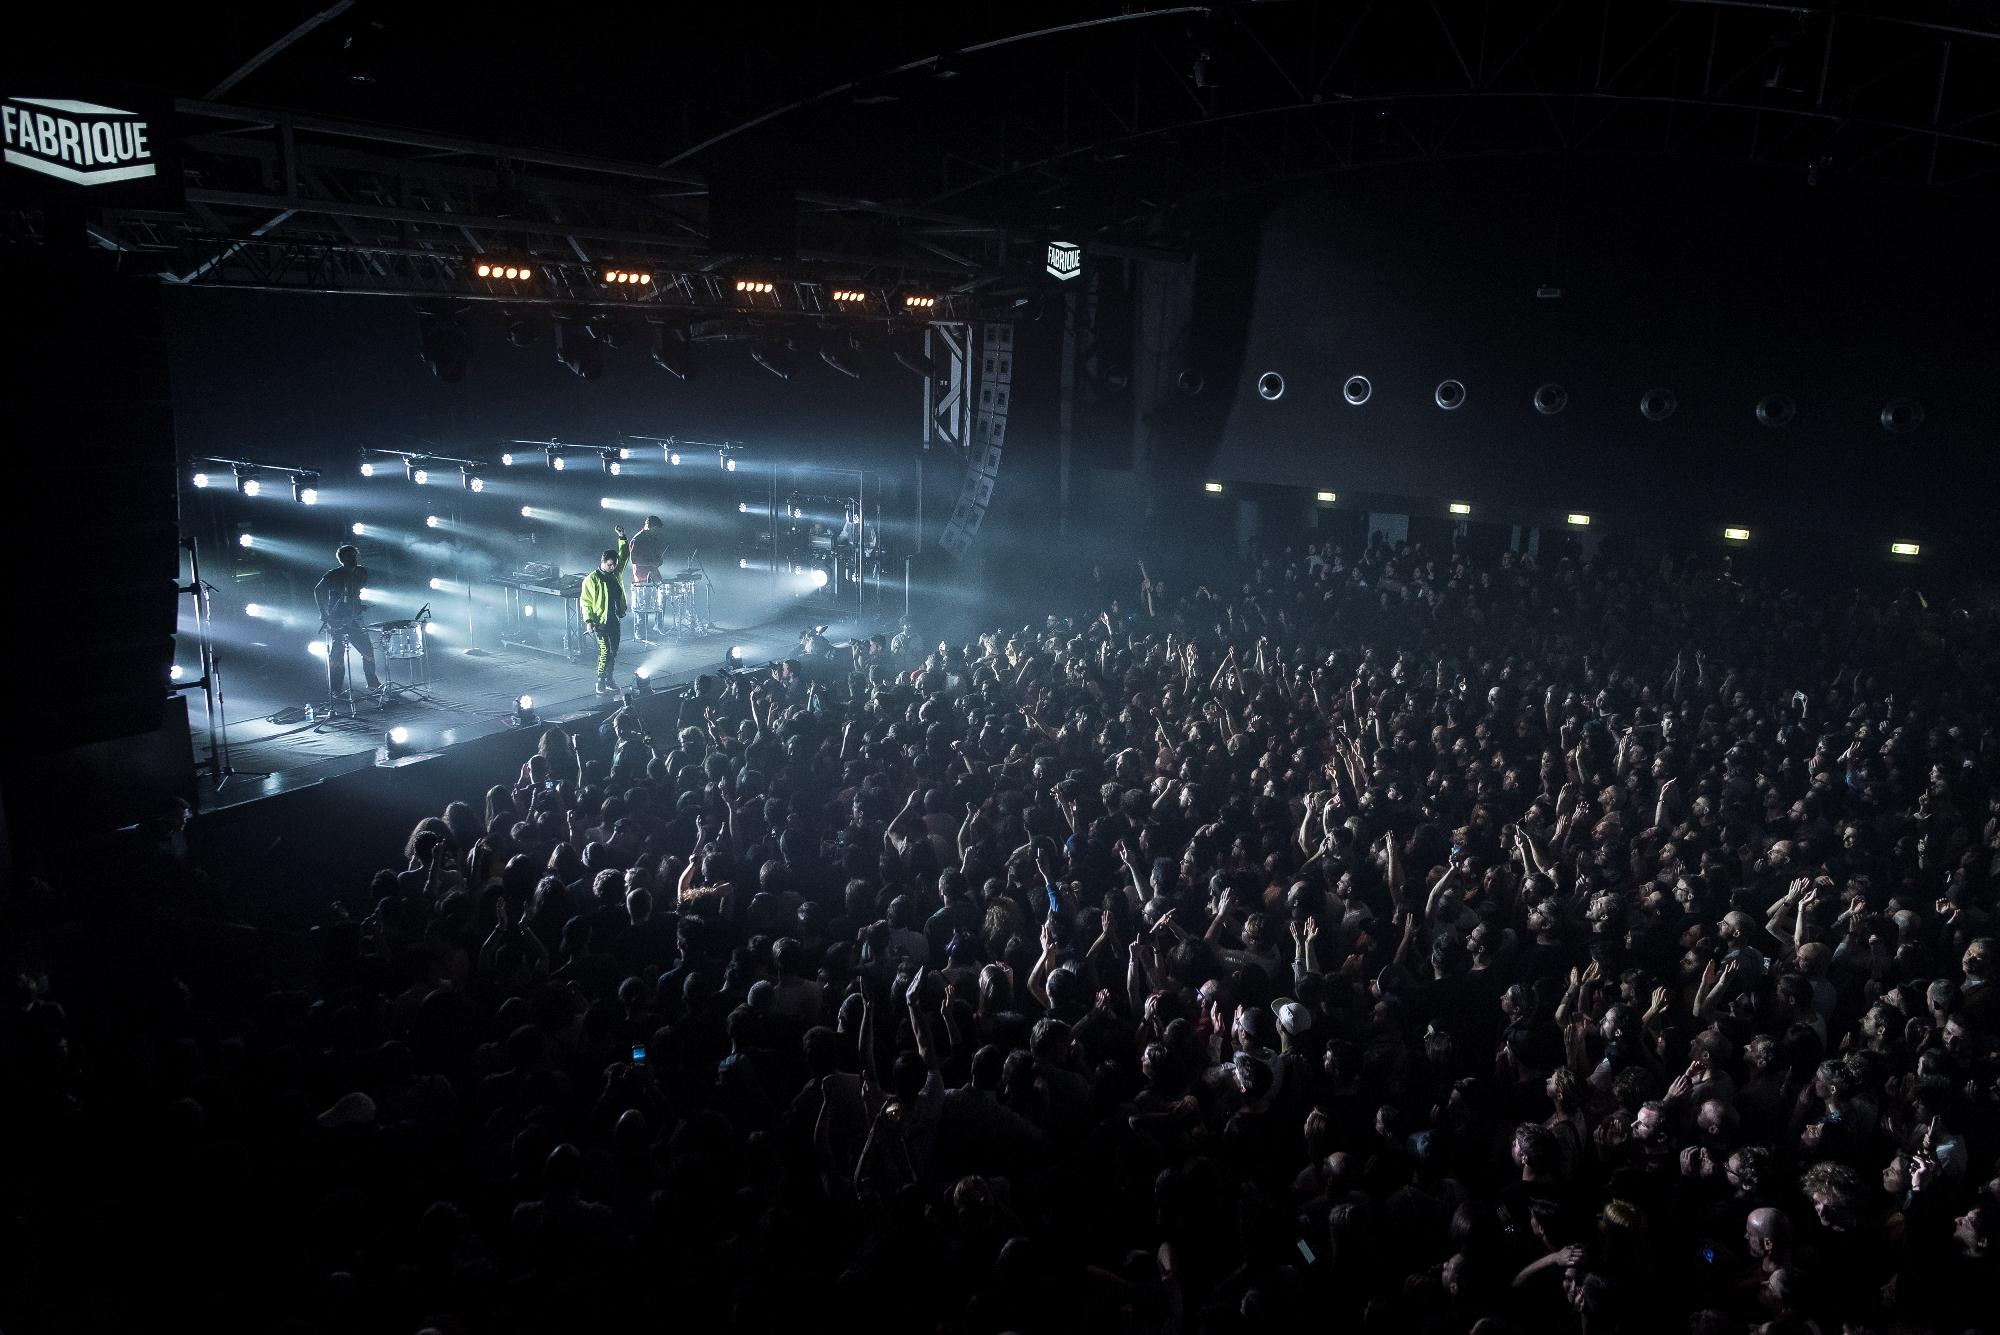 Cosmo live - Fabrique Milano